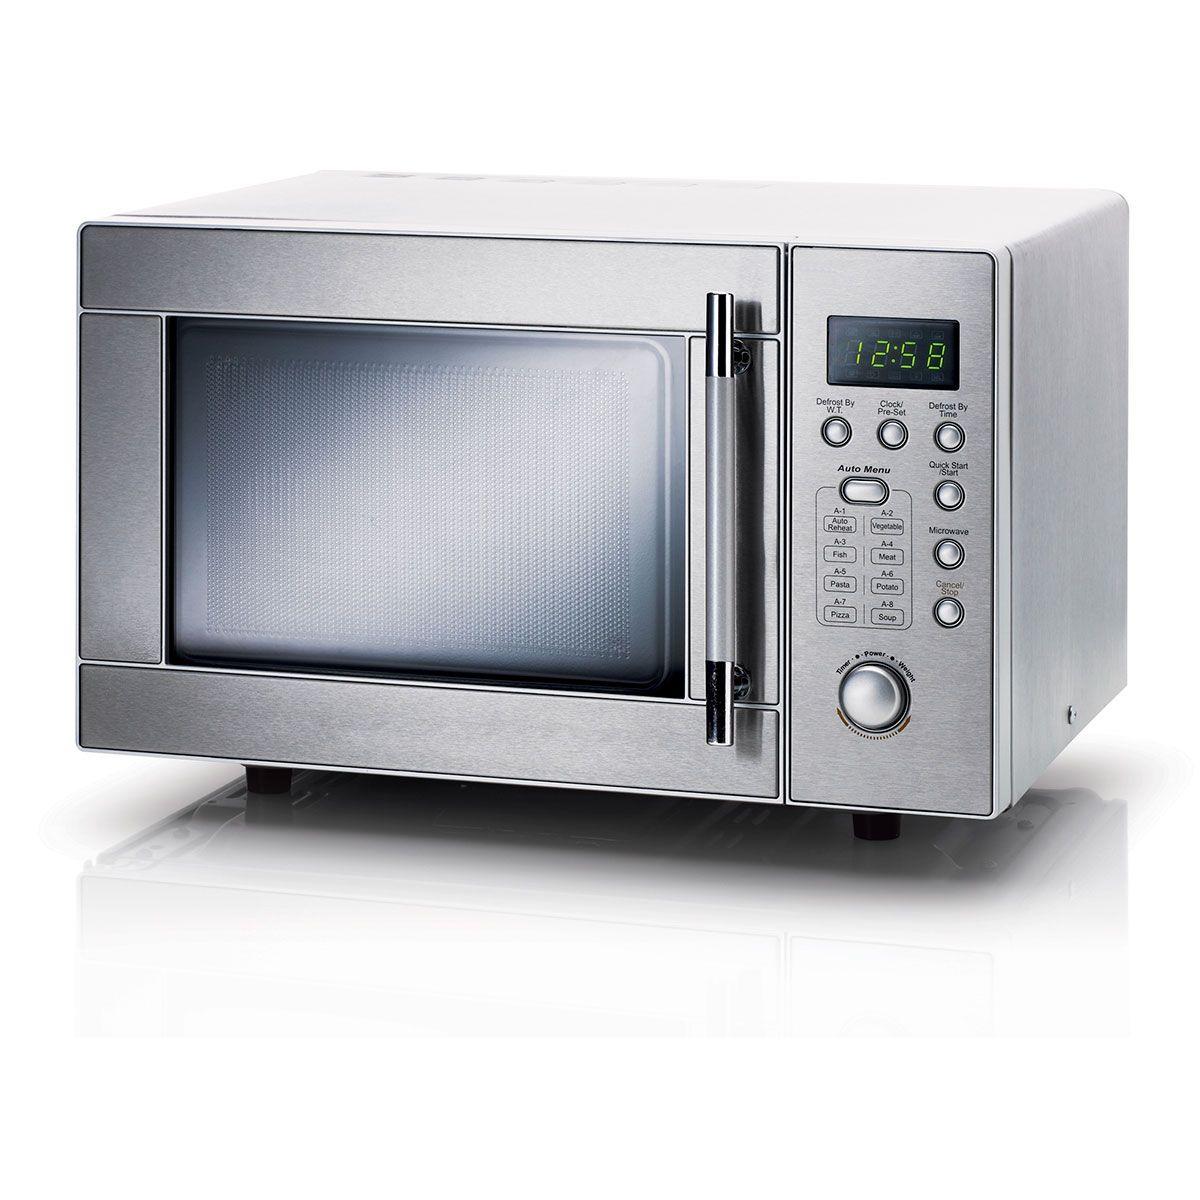 stainless steel digital microwave oven